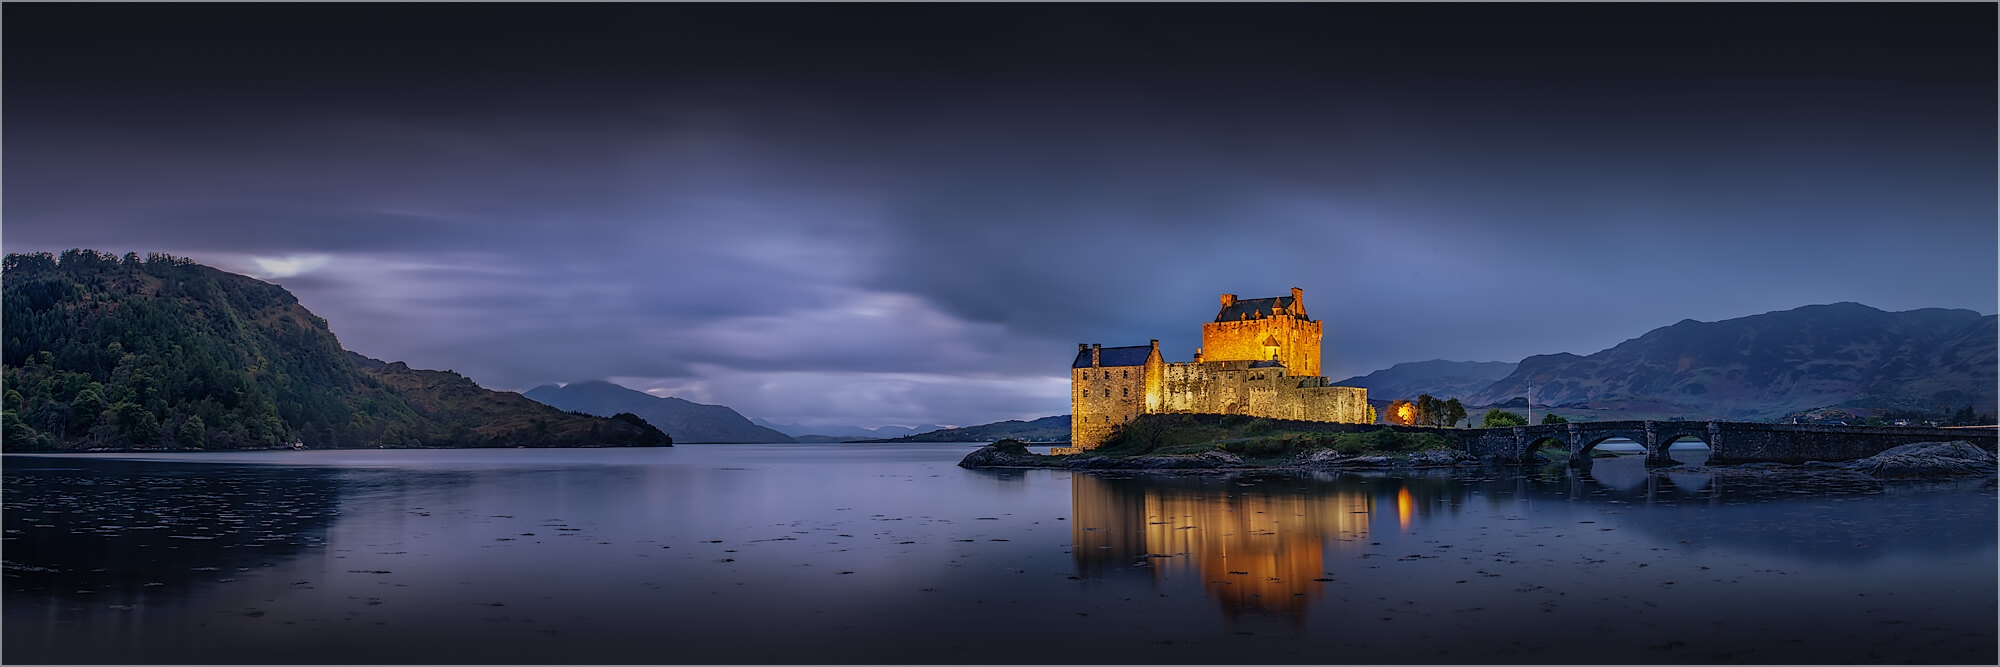 Panoramabild abends am Eilean Donan Castle Schottland